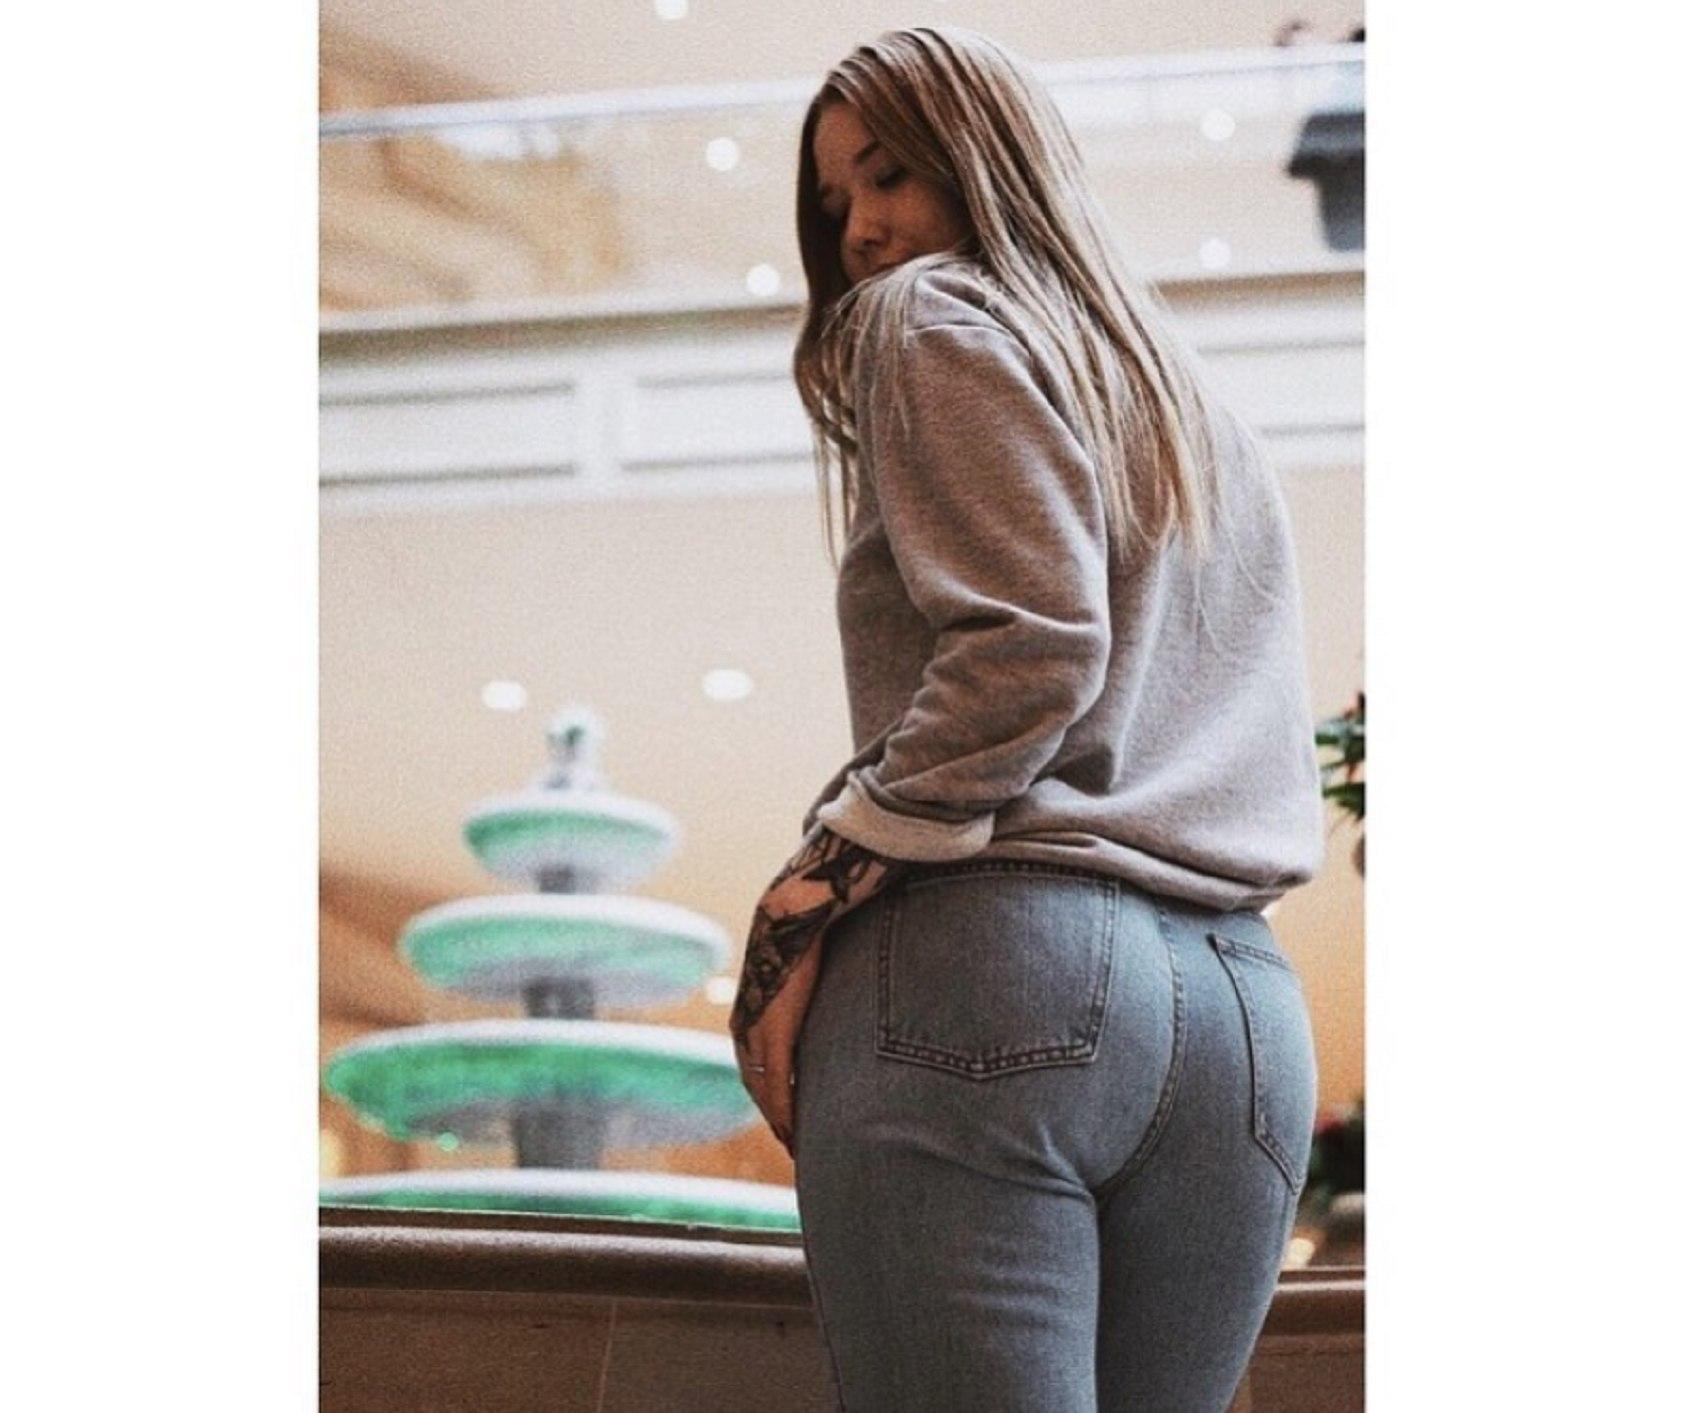 Фото девушек со спины (25 фото) - Аня, 19 лет, Нижний Новгород